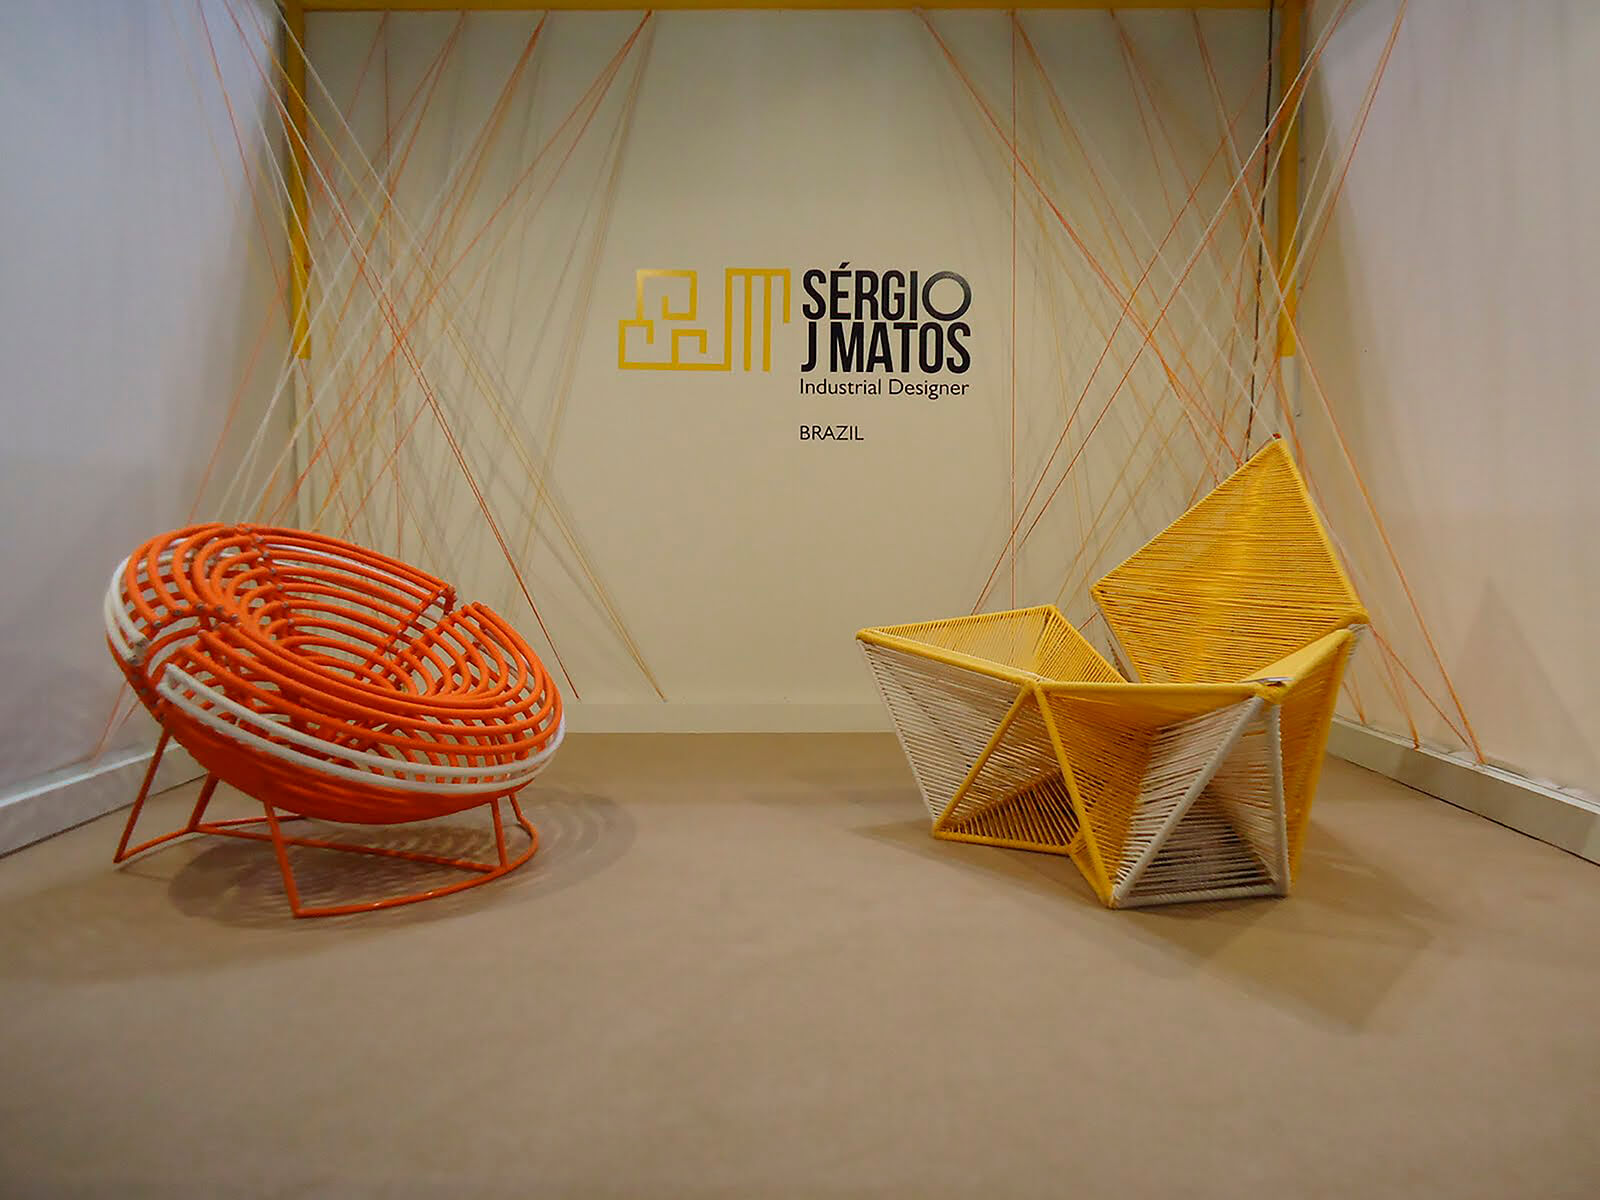 Sérgio J. Matos, 'Balaio' armchair, 2010 (left) and 'Balão' armchair, 2010 (right) at Satellite Salon COURTESY: Sérgio J. Matos